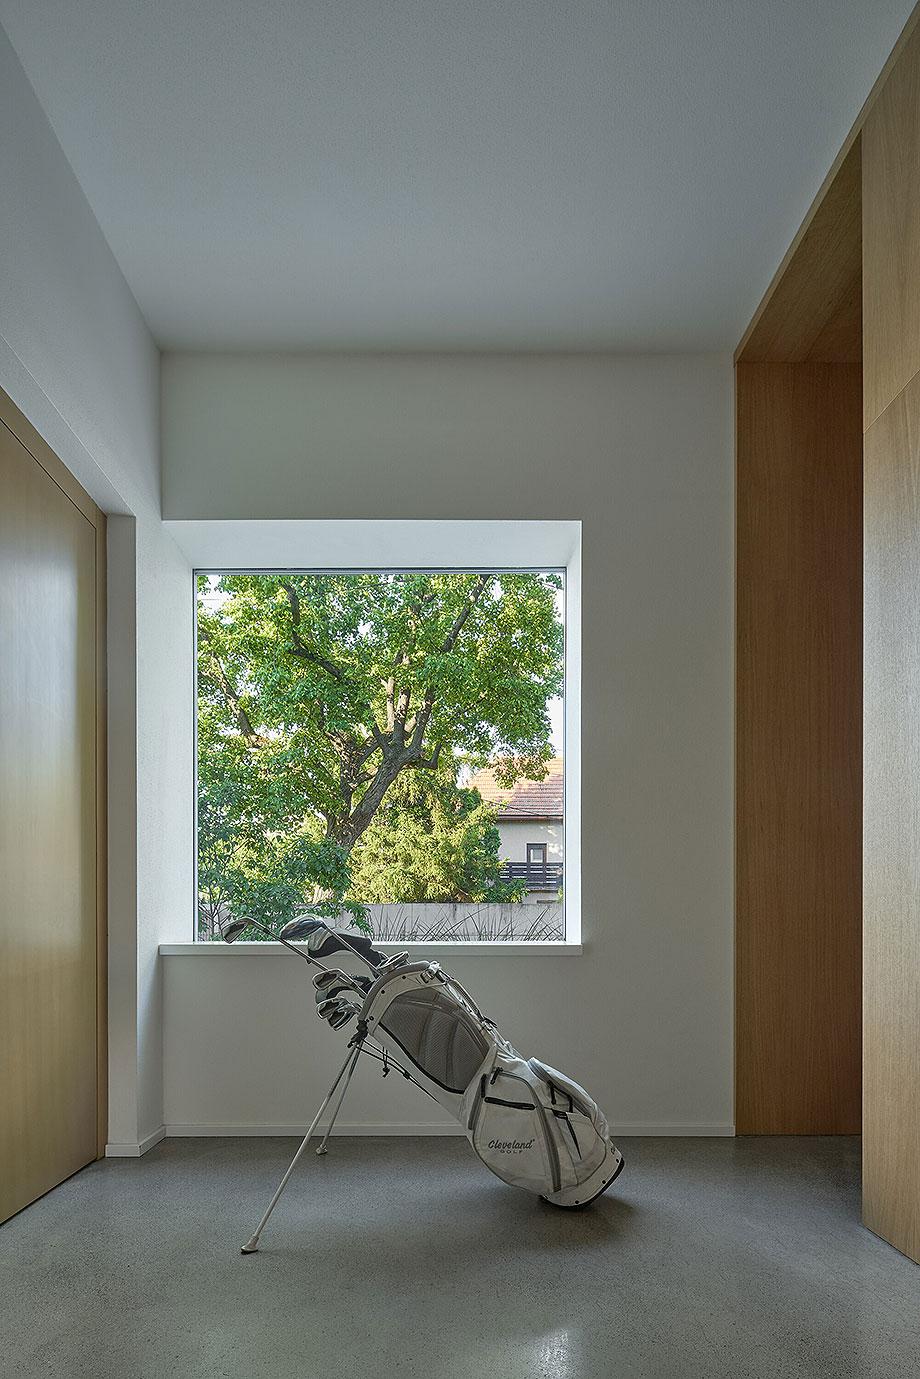 casa lhotka en praga de soa architekti y richter design (14) - foto boysplaynice